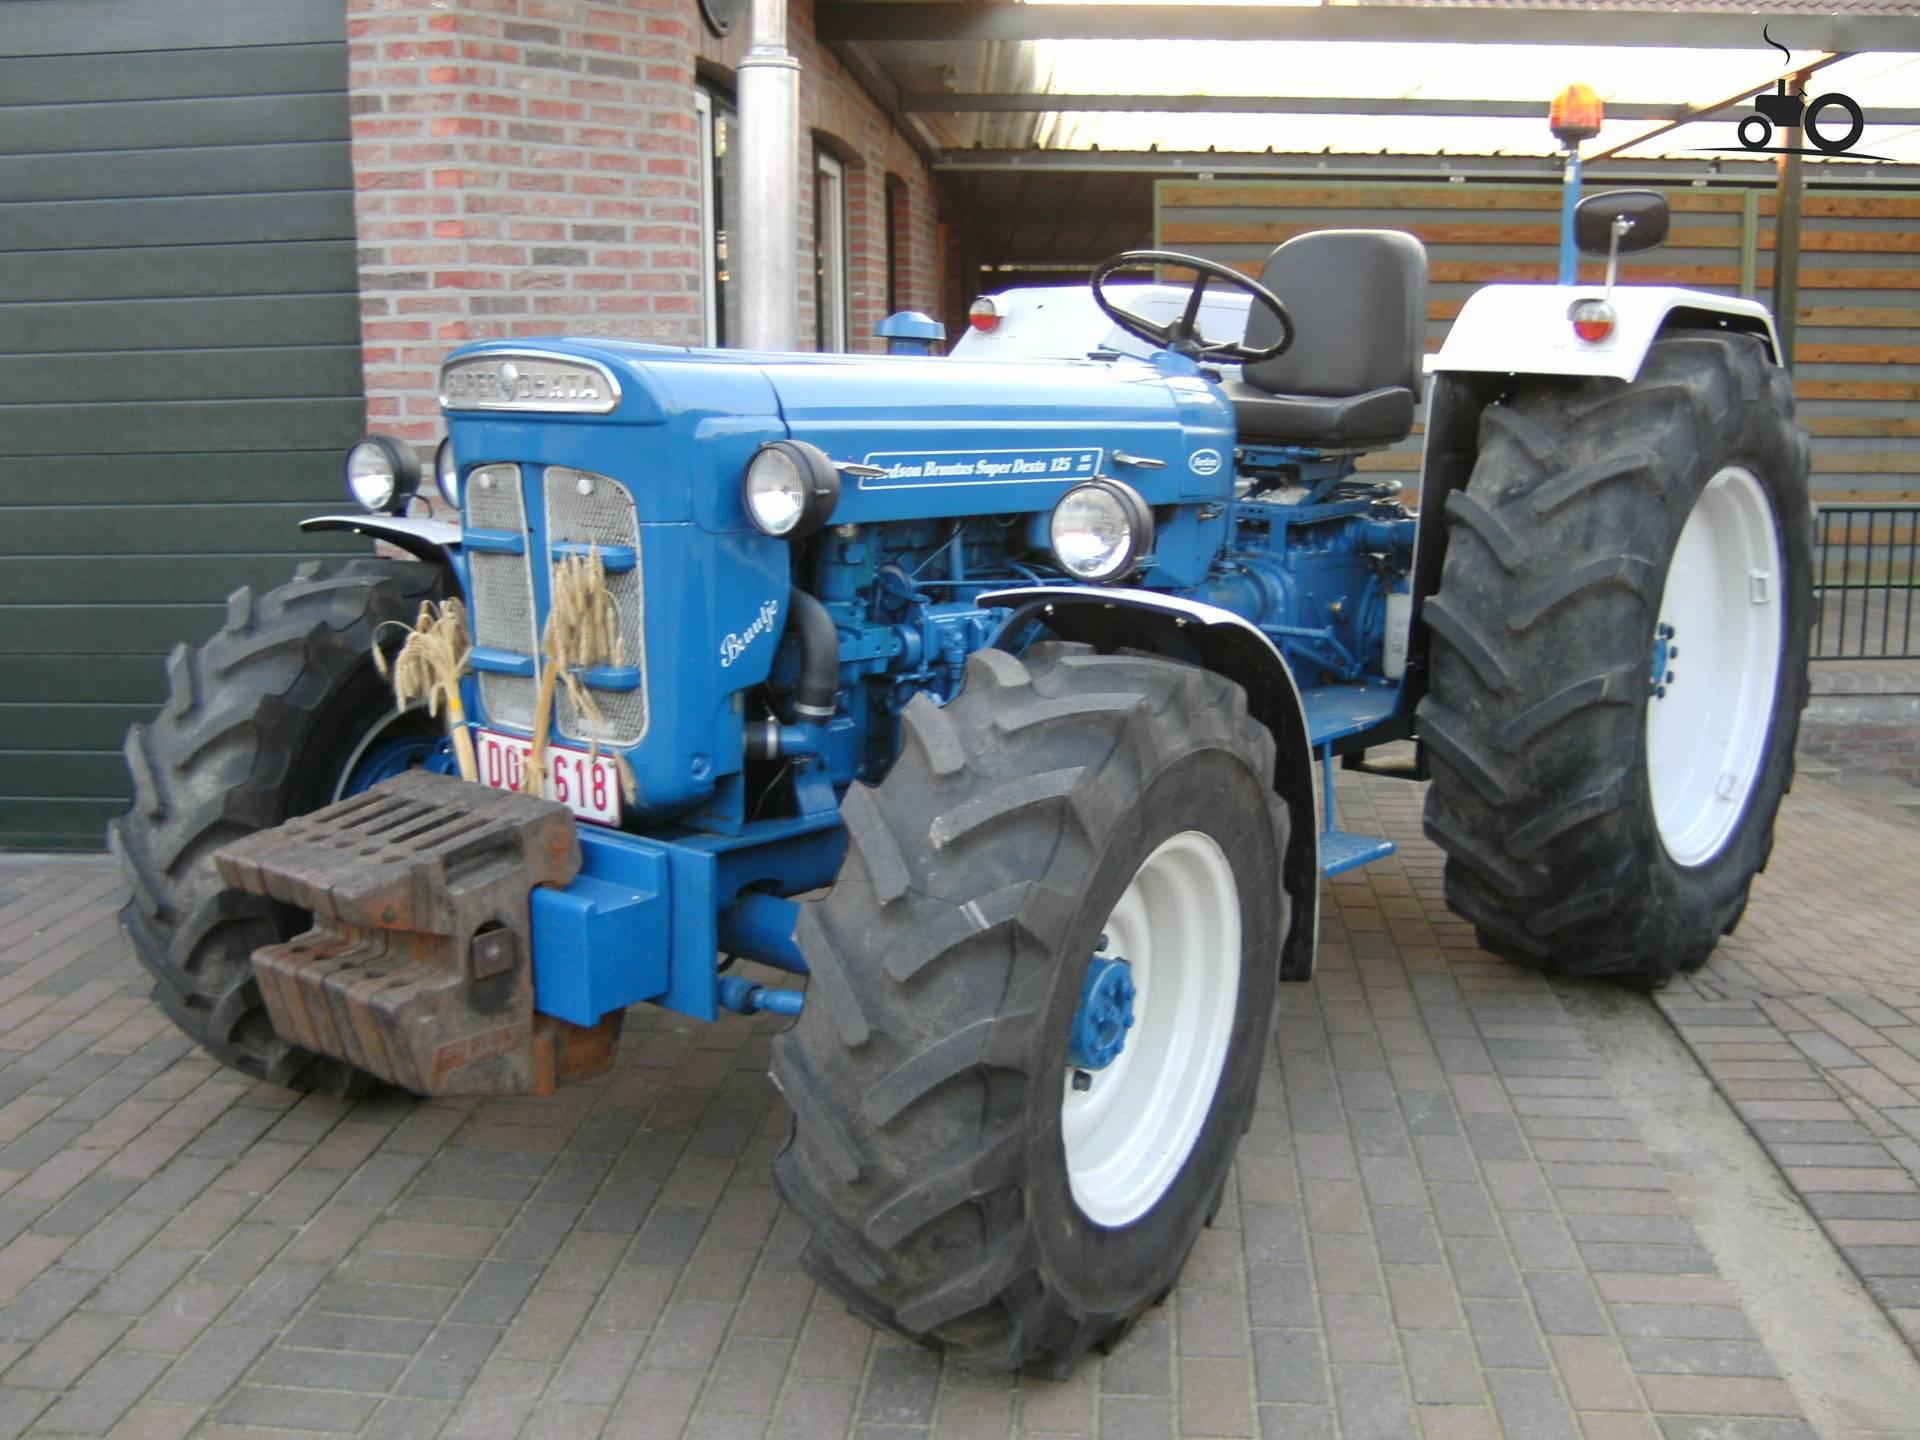 Ford Super Dexta Tractor Values : Ford super dexta ebay electronics cars fashion autos post